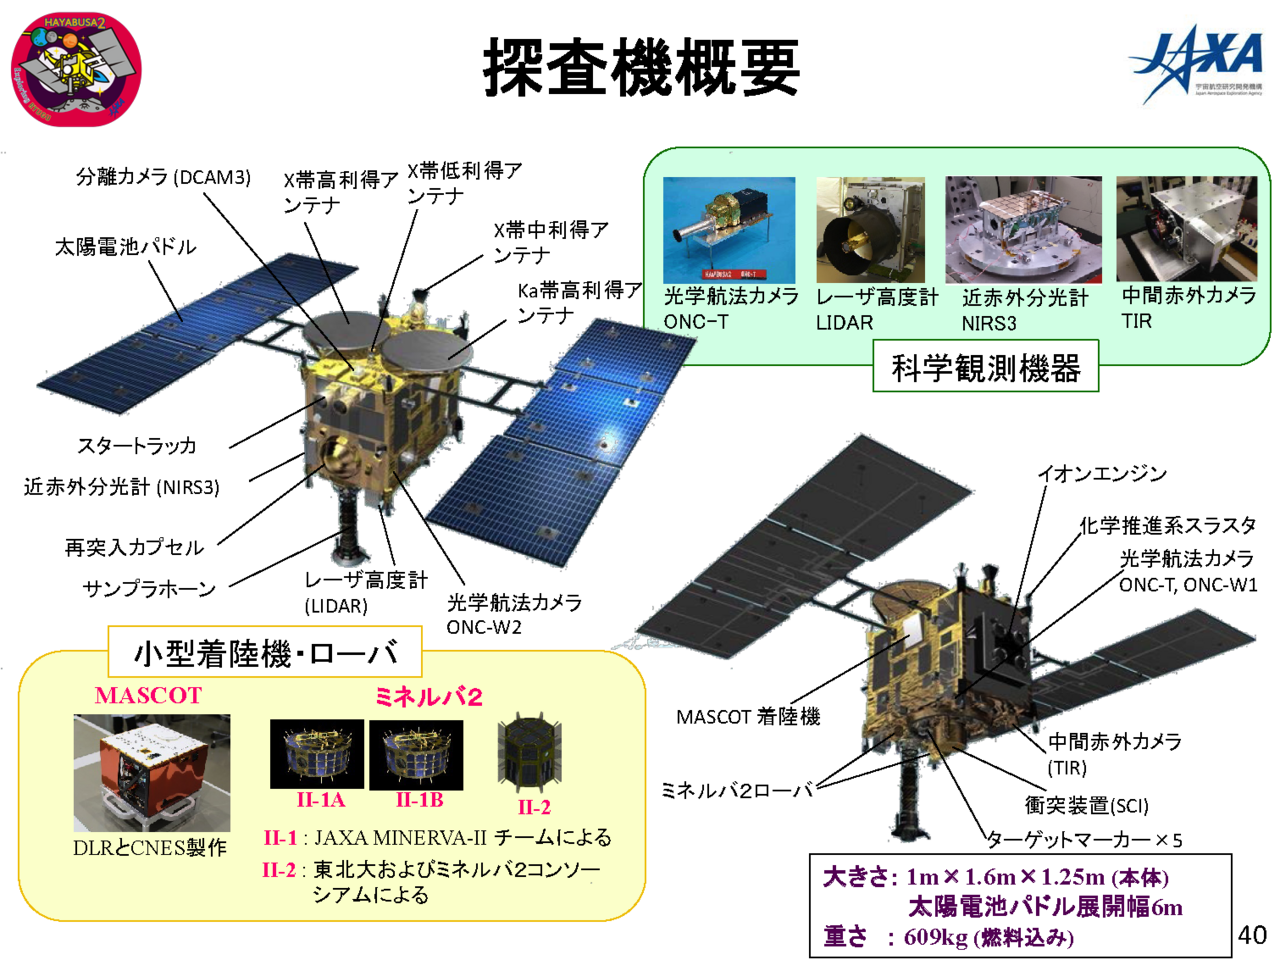 f:id:Imamura:20180802150000p:plain